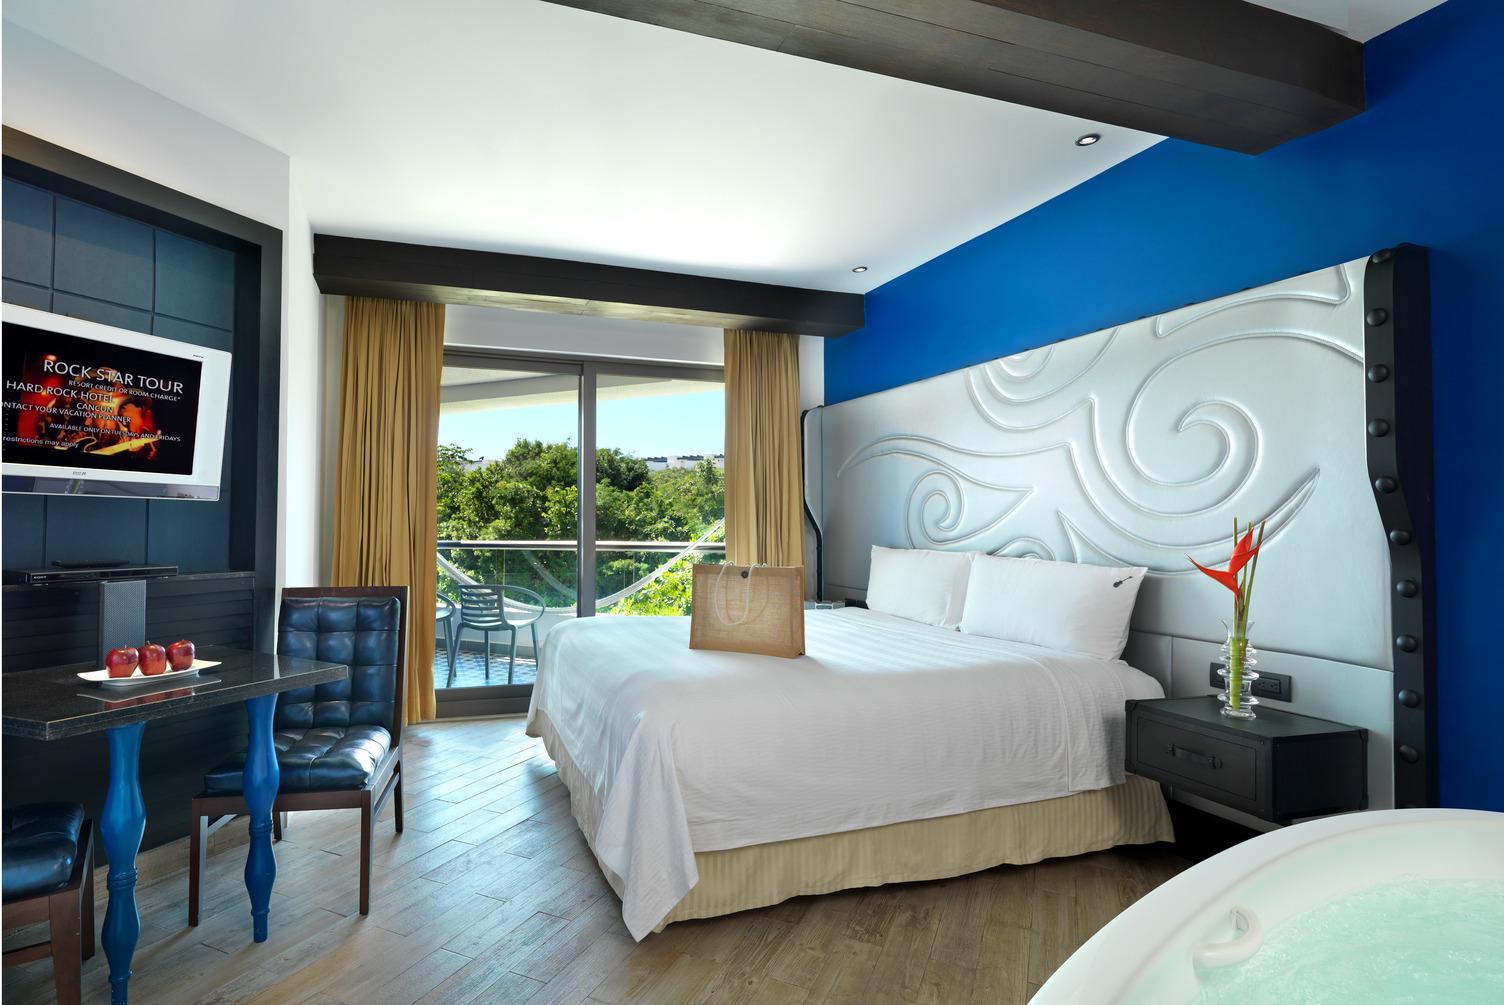 Travel Agency All-Inclusive Resort Heaven at Hard Rock Hotel Riviera Maya 32